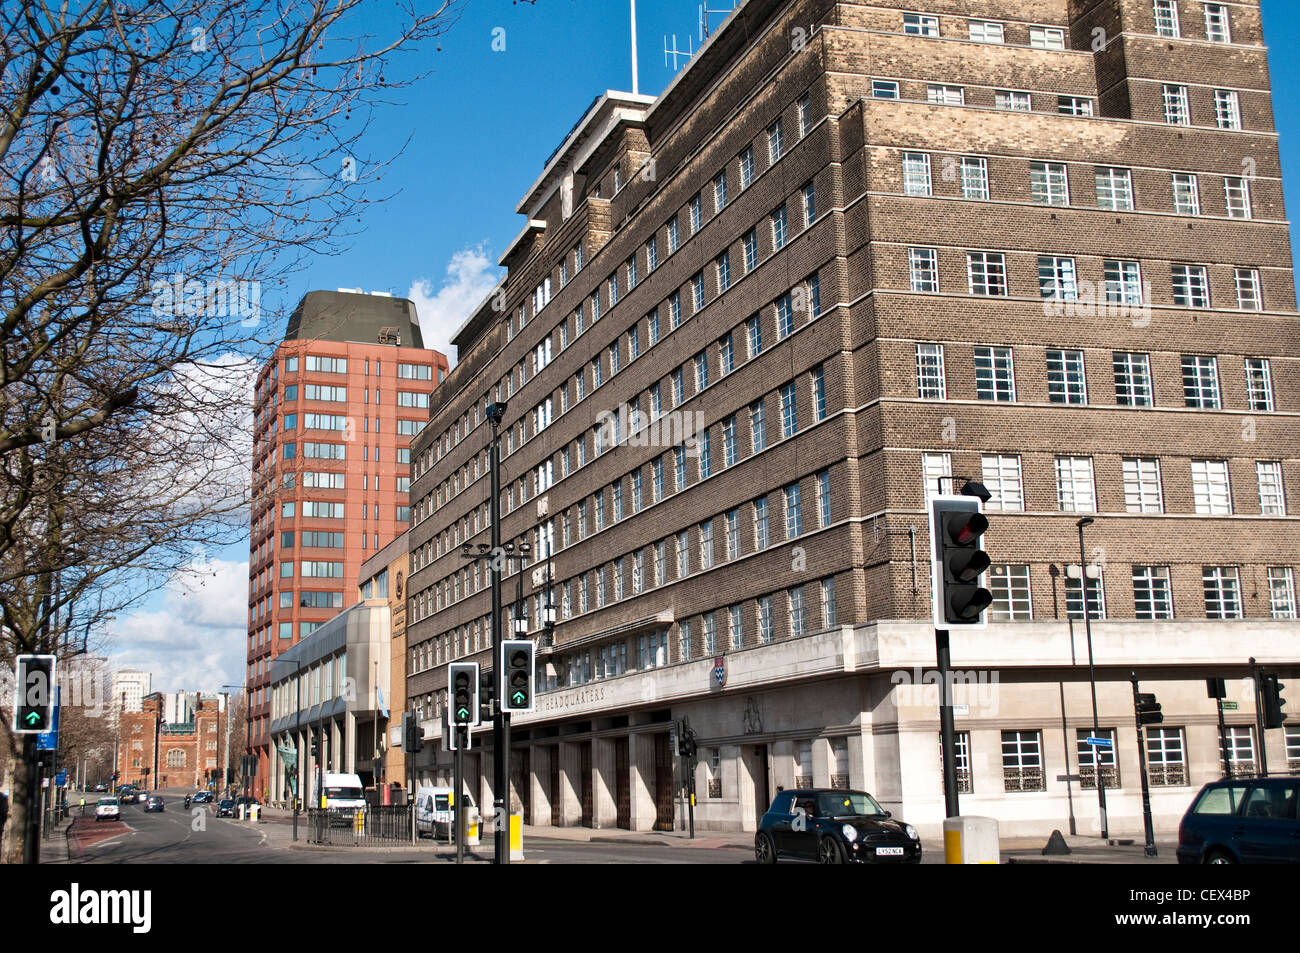 London Fire Brigade headquarters on Albert Embankment, Lambeth, London, UK - Stock Image